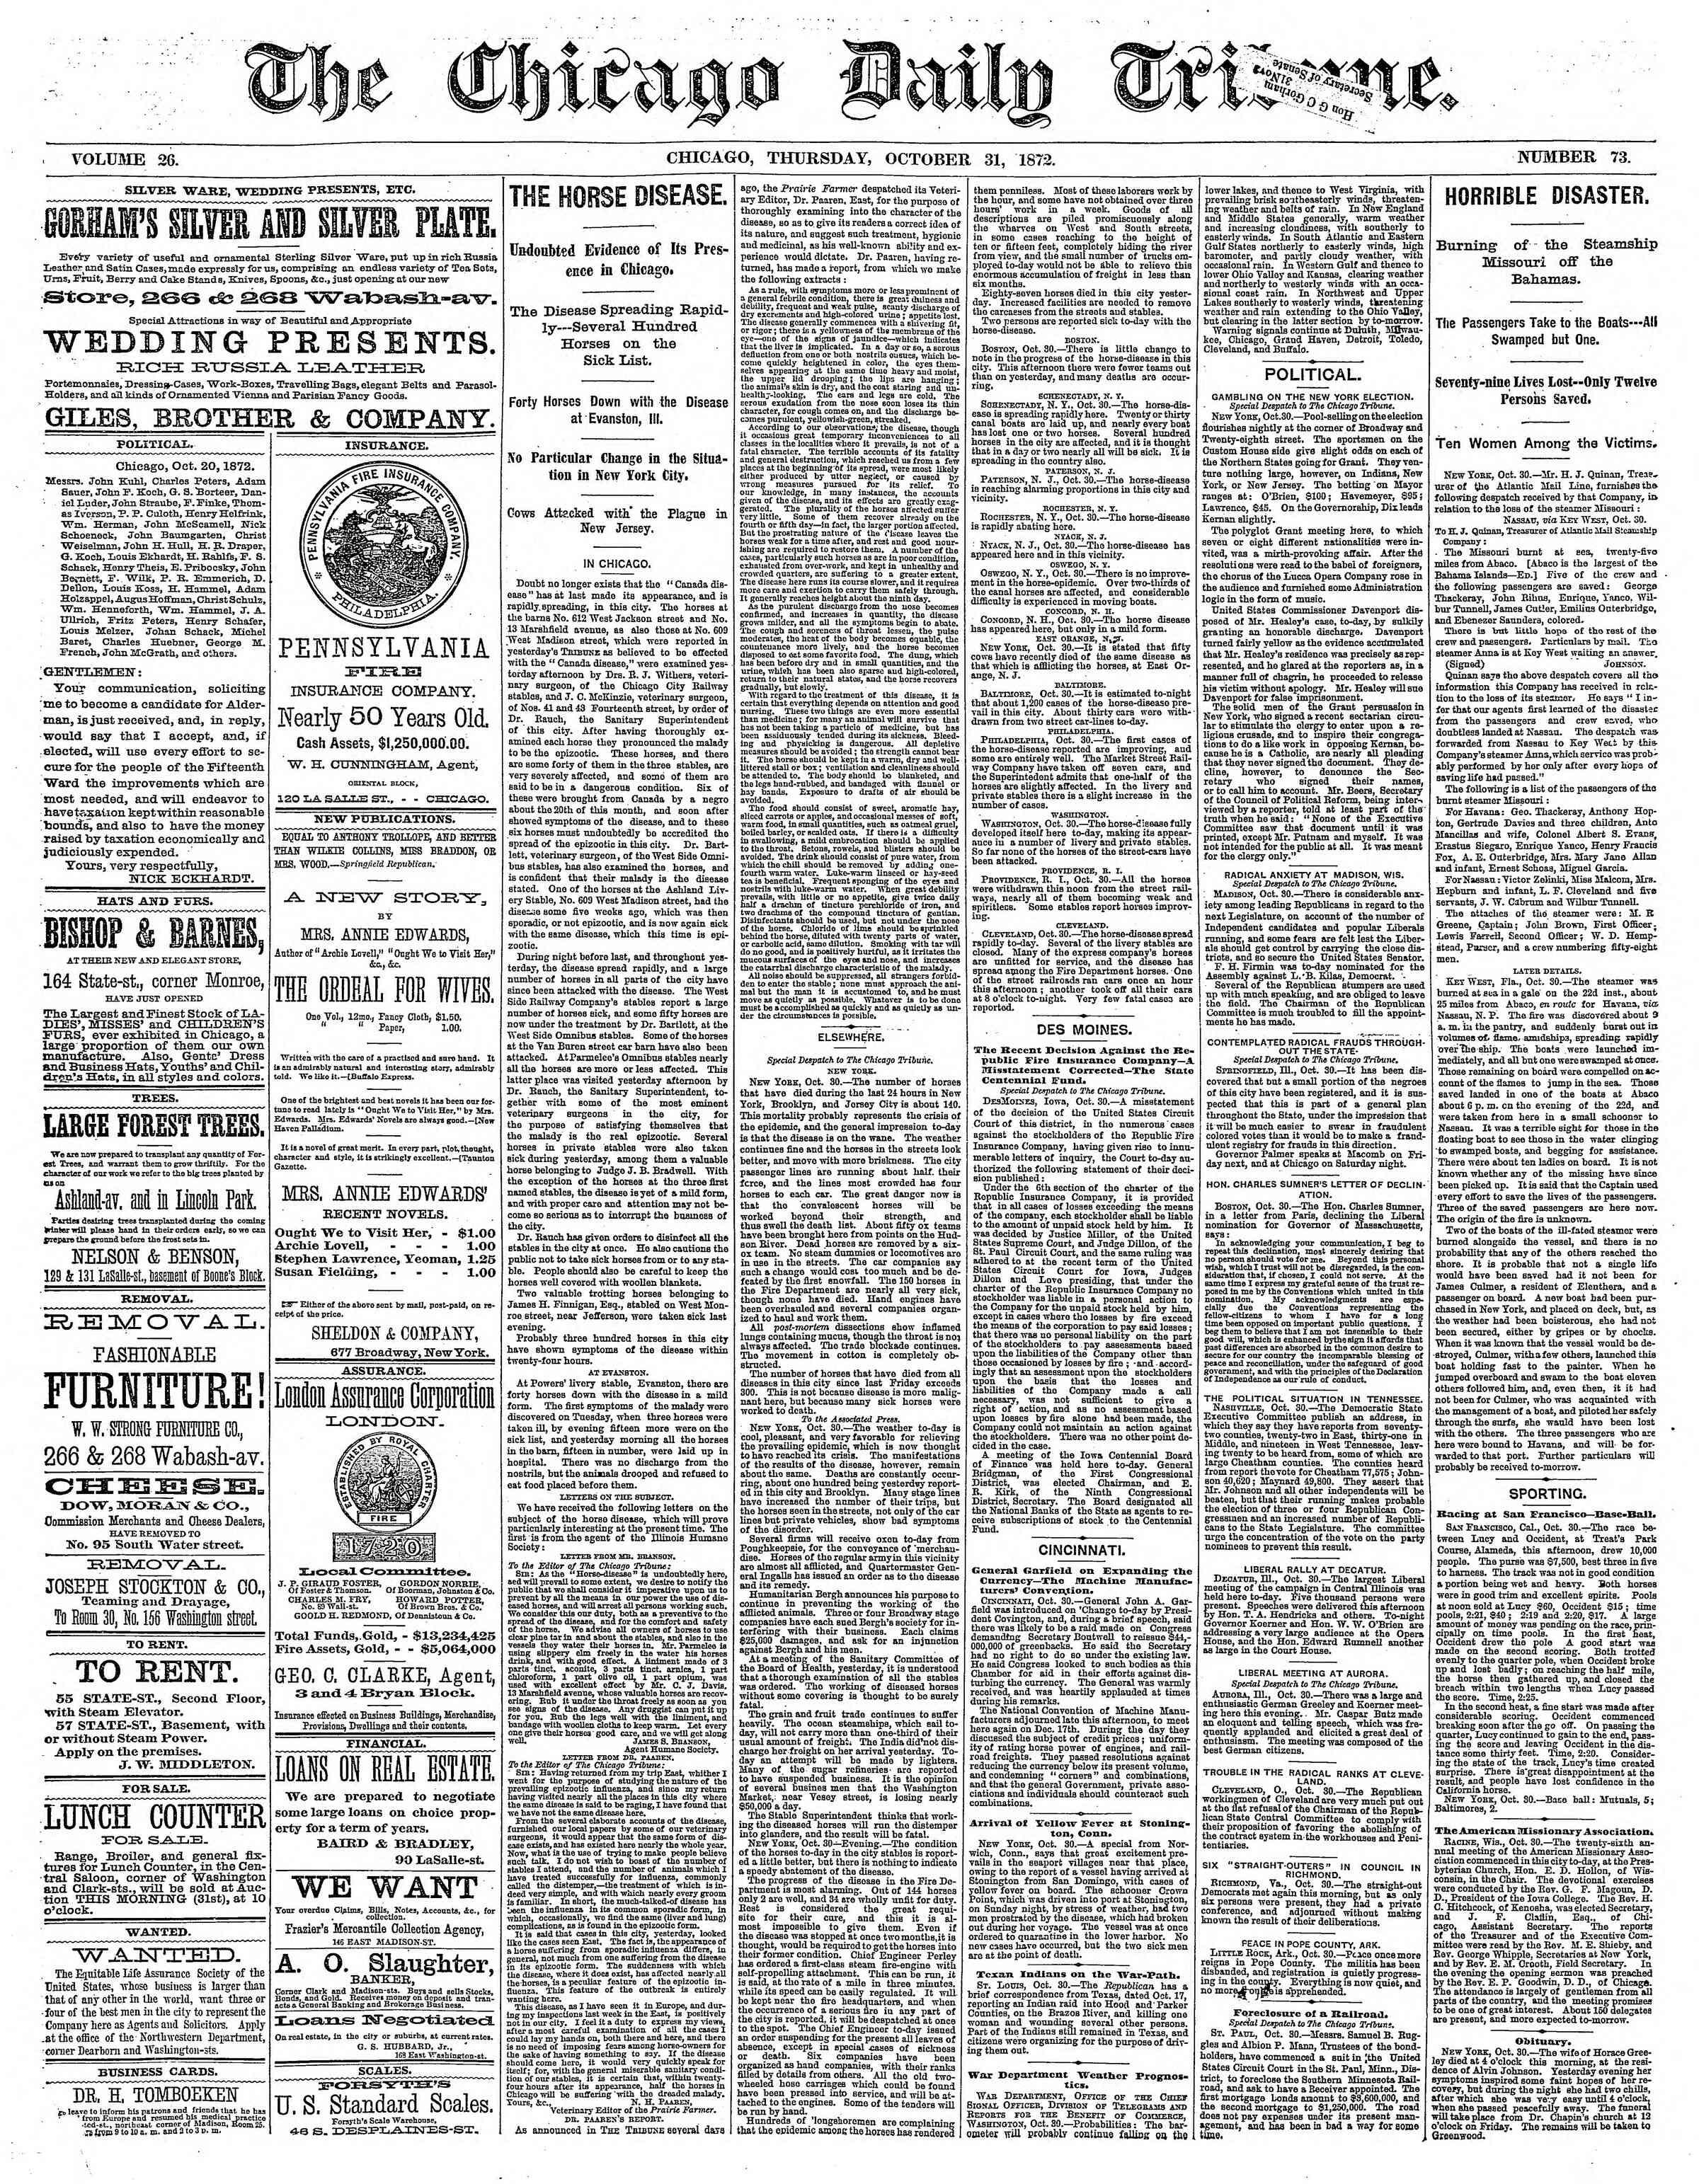 31 Ekim 1872 Tarihli Chicago Daily Tribune Dergisi Sayfa 1